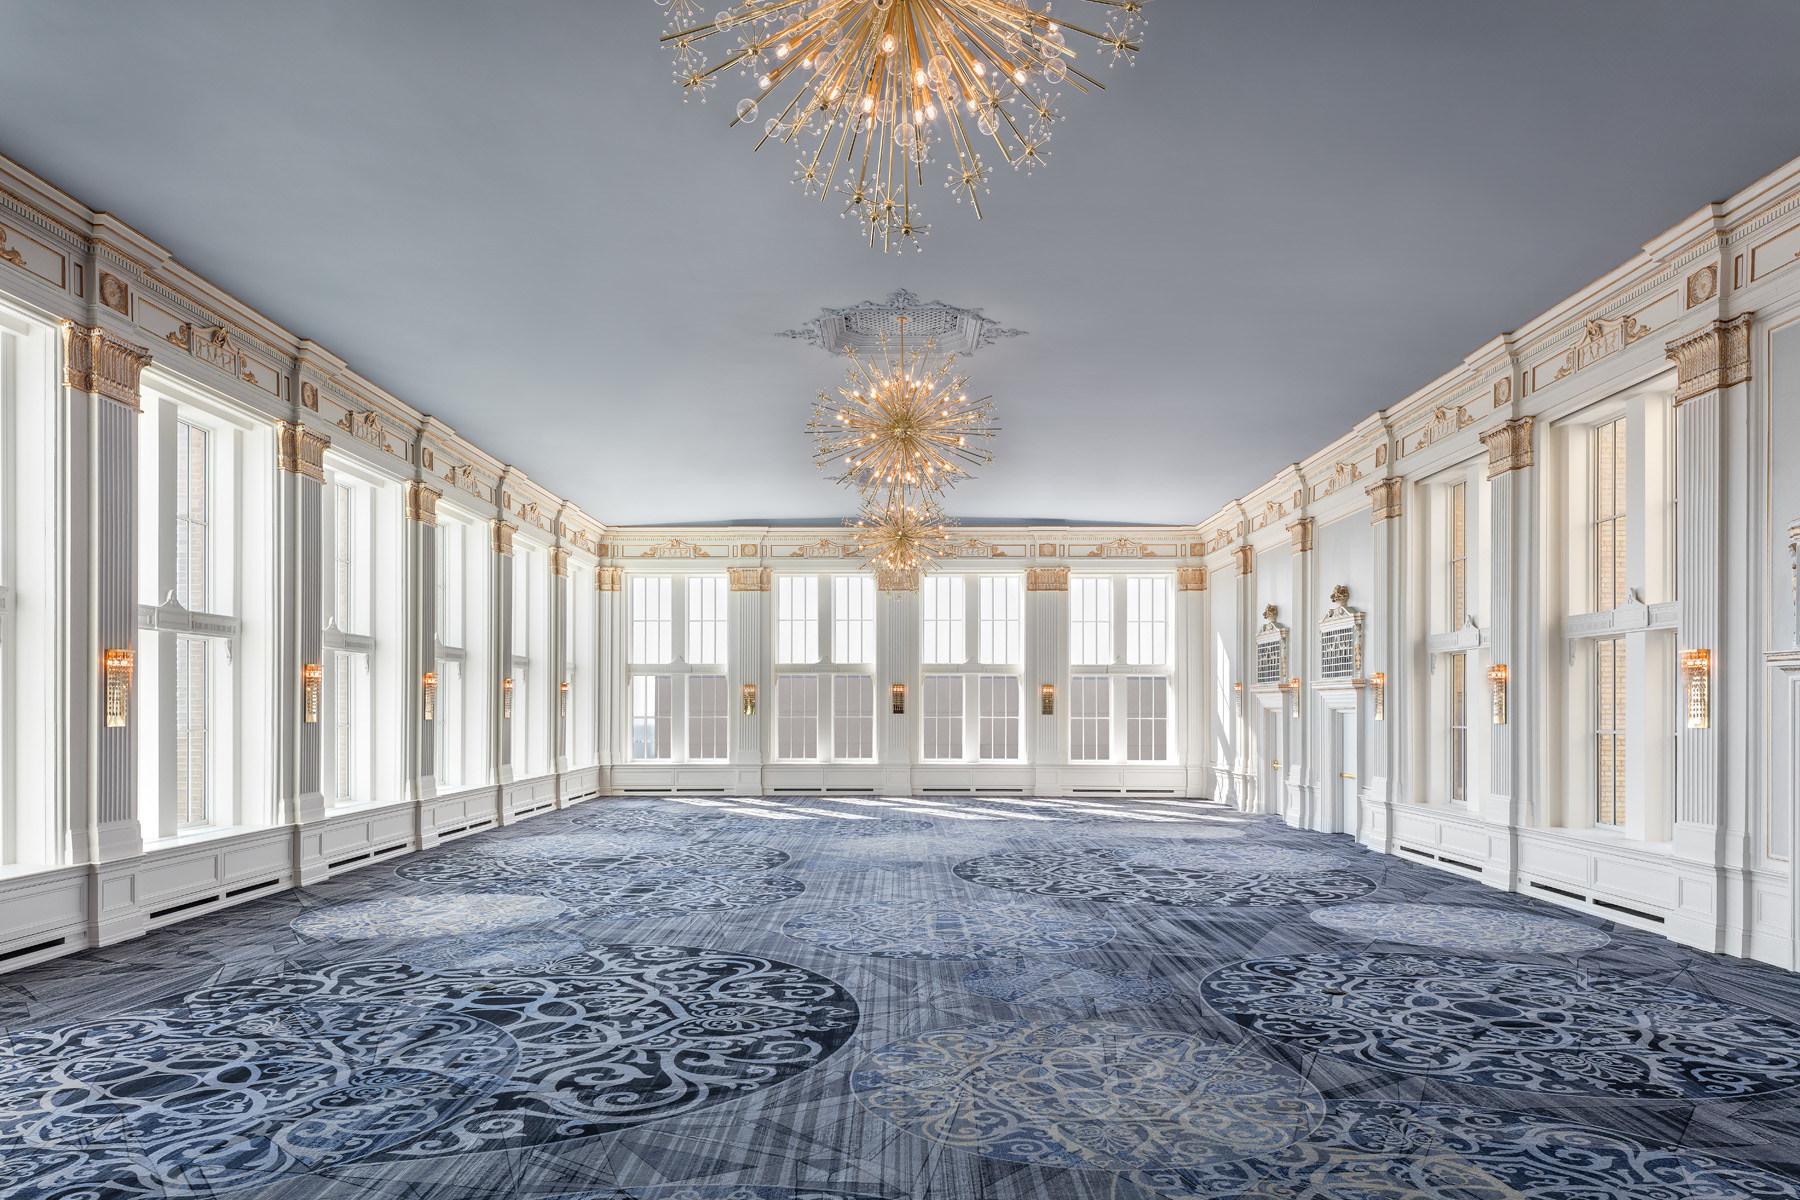 Omni_King_Edward_Hotel_The_Omni_King_Edward_Hotel_s_Crystal_Ball.jpg